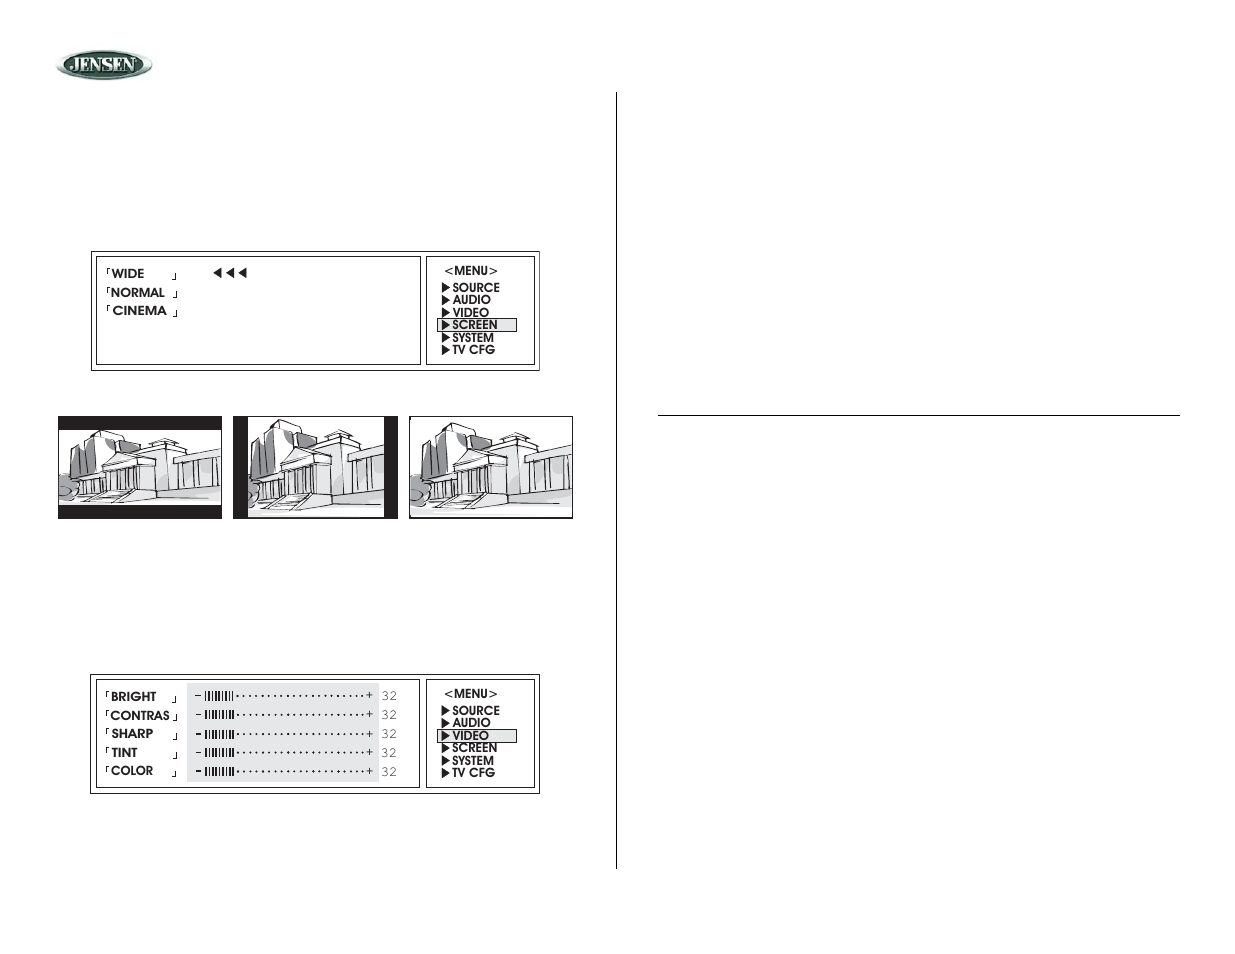 jensen vm9510 wiring diagram reinvent your wiring diagram u2022 rh  kismetcars co uk jensen rv stereo